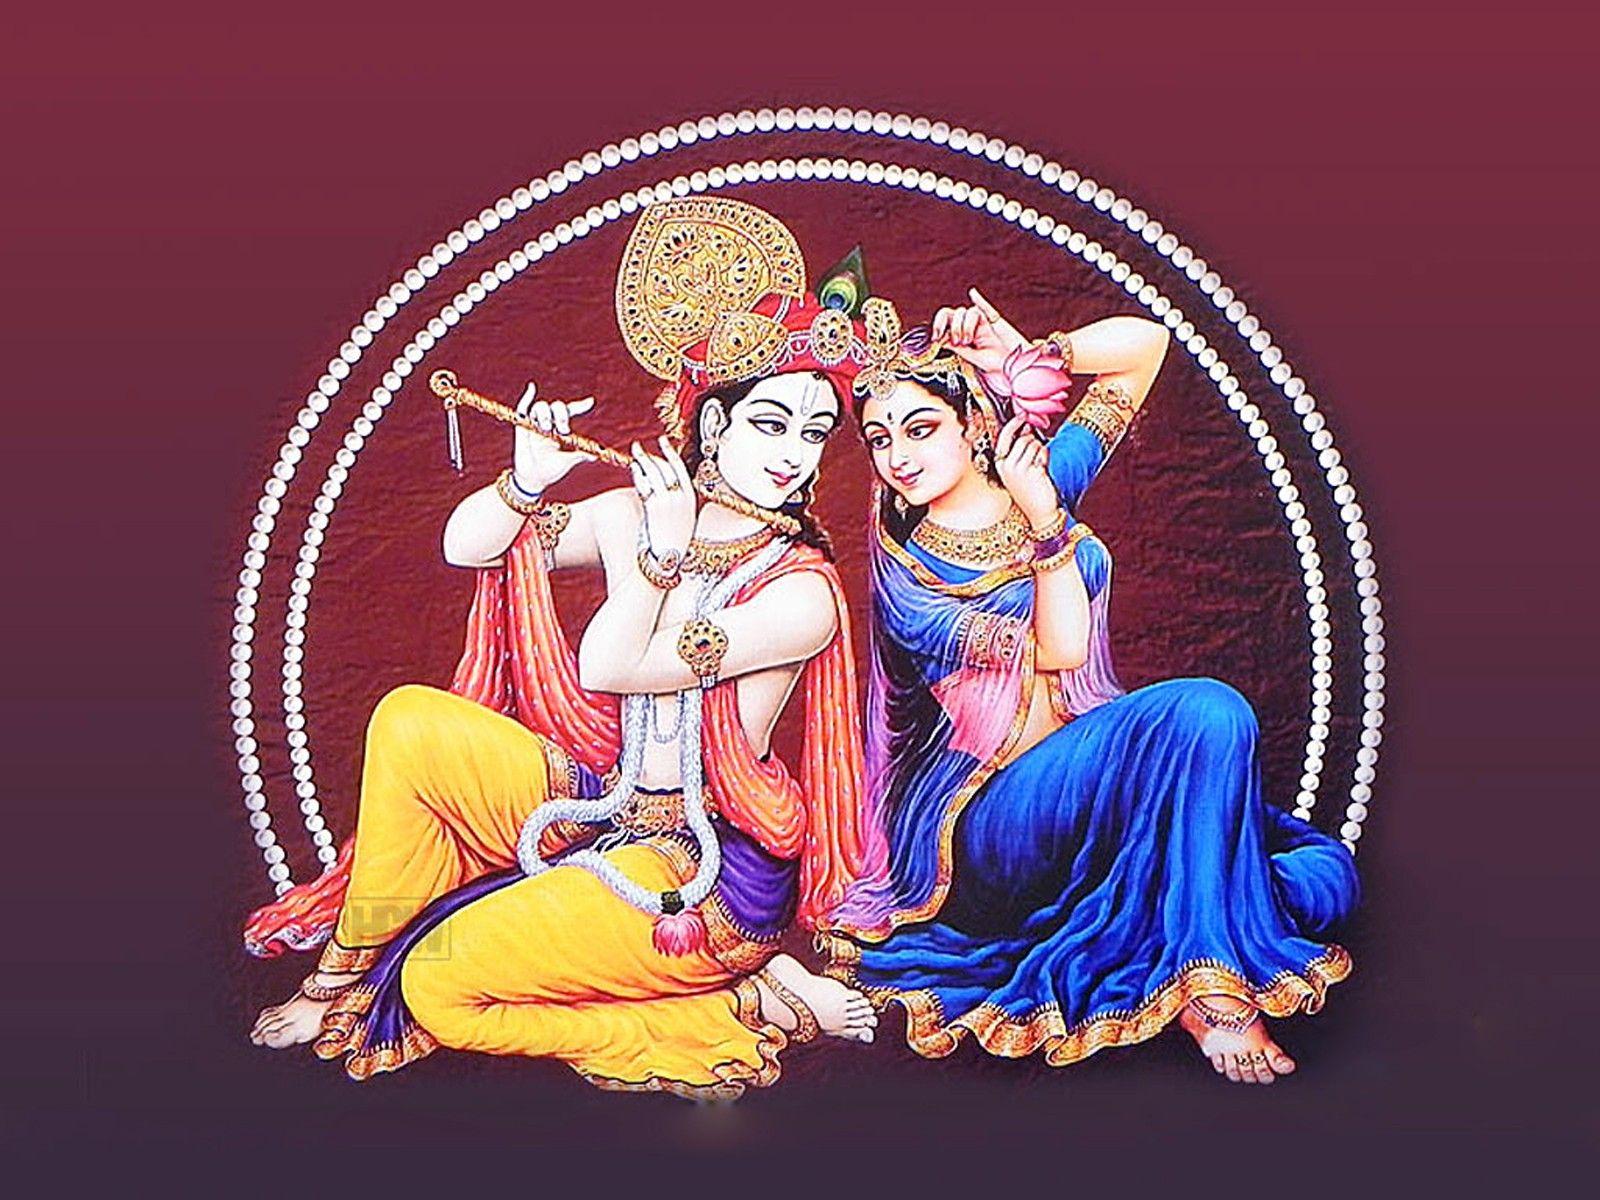 Bhagwan Krishna With Radha Hd Wallpaper Free 1080p Krishna Wallpaper Krishna Images Radha Krishna Wallpaper